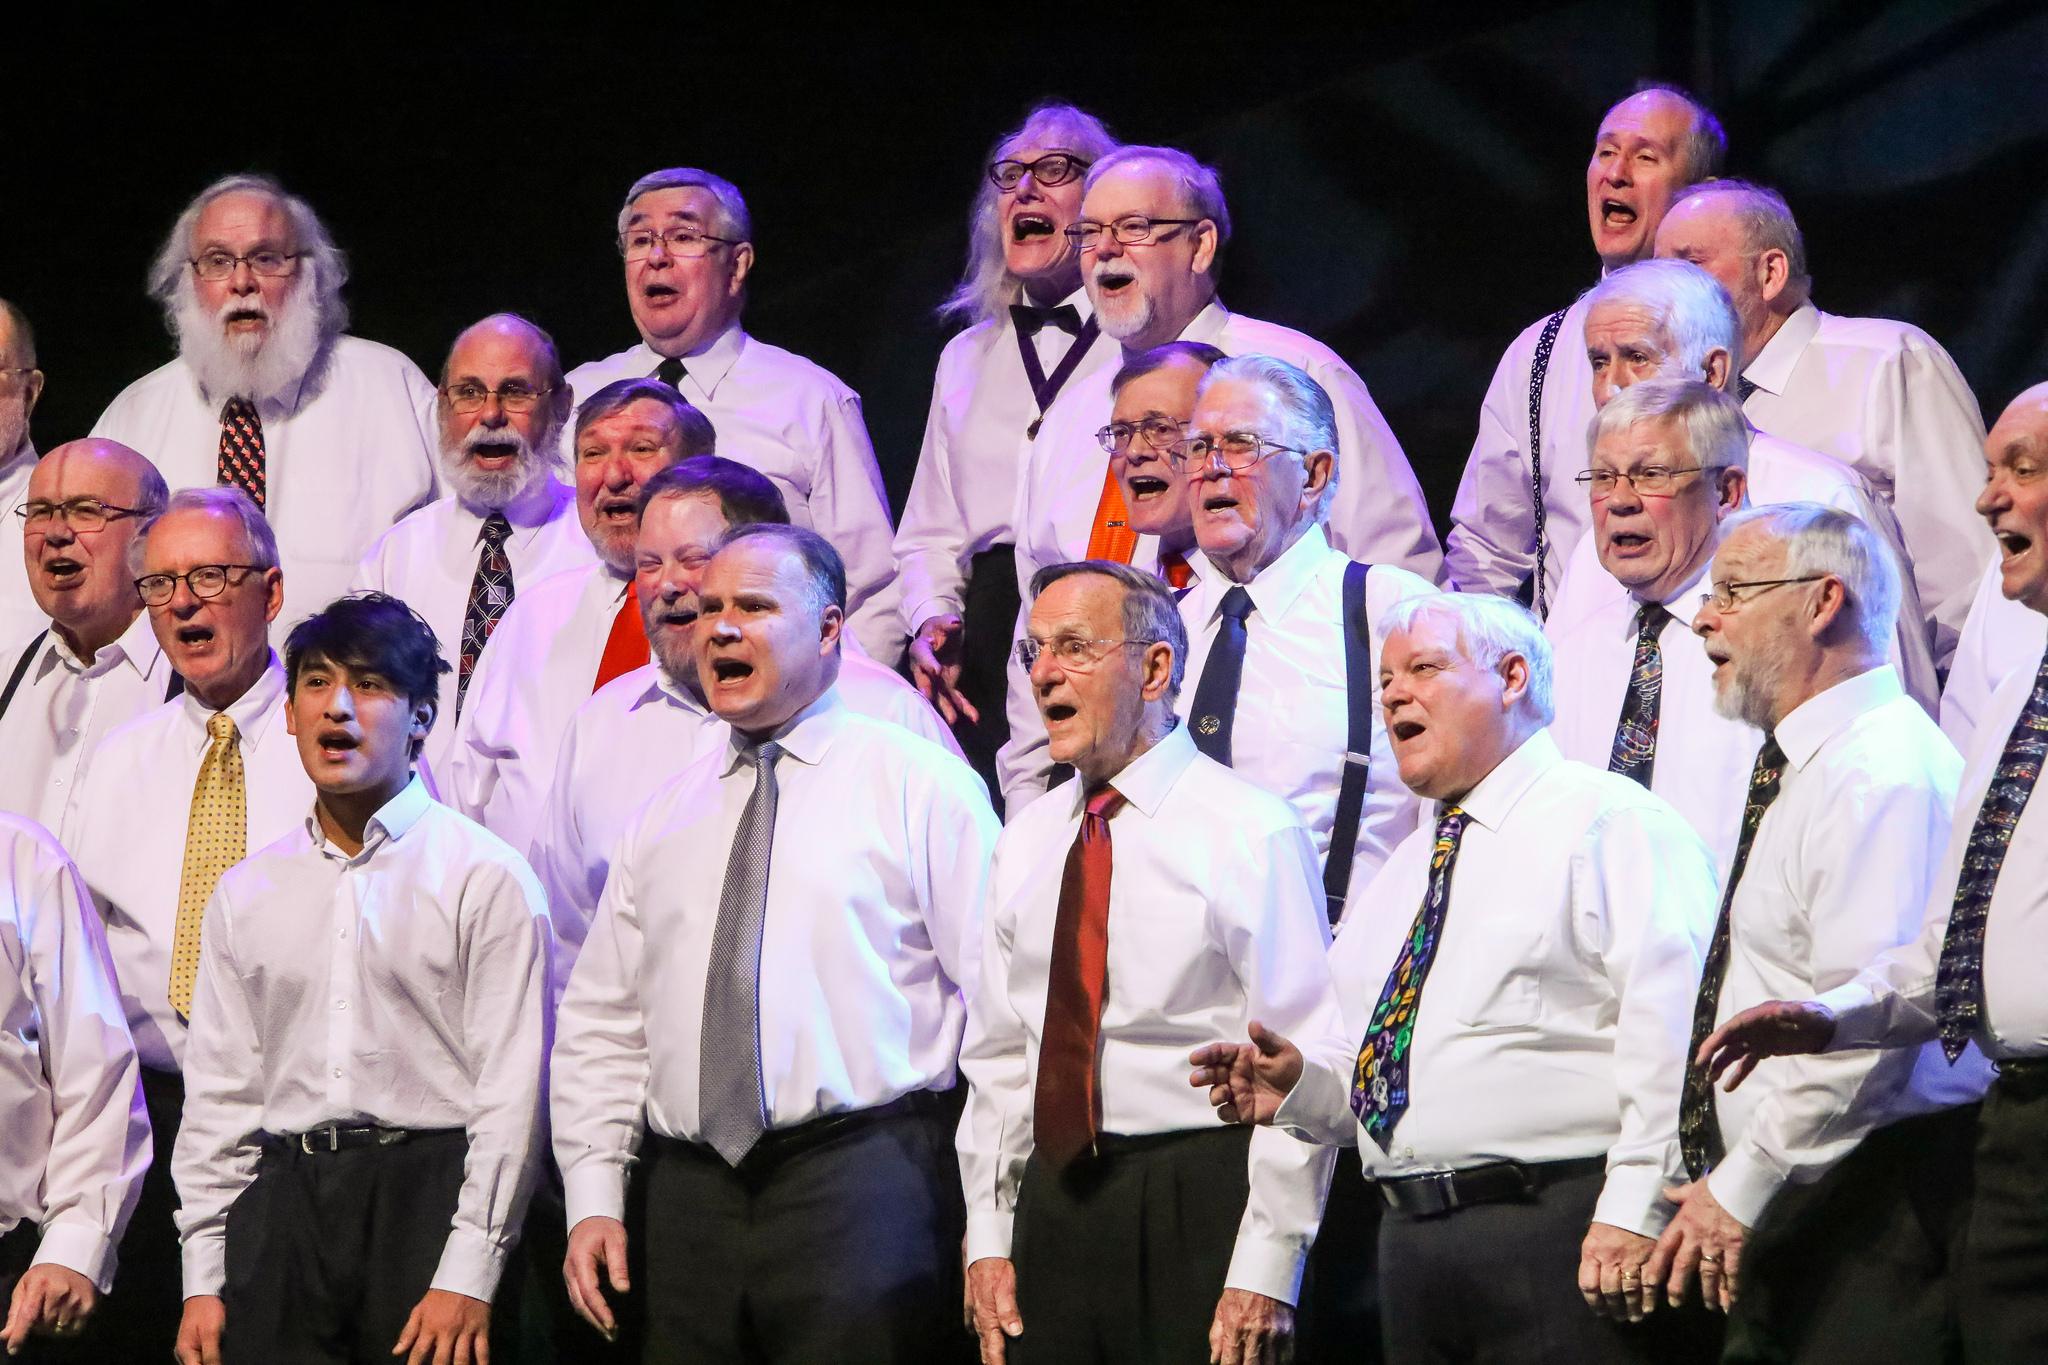 All Chapter Chorus